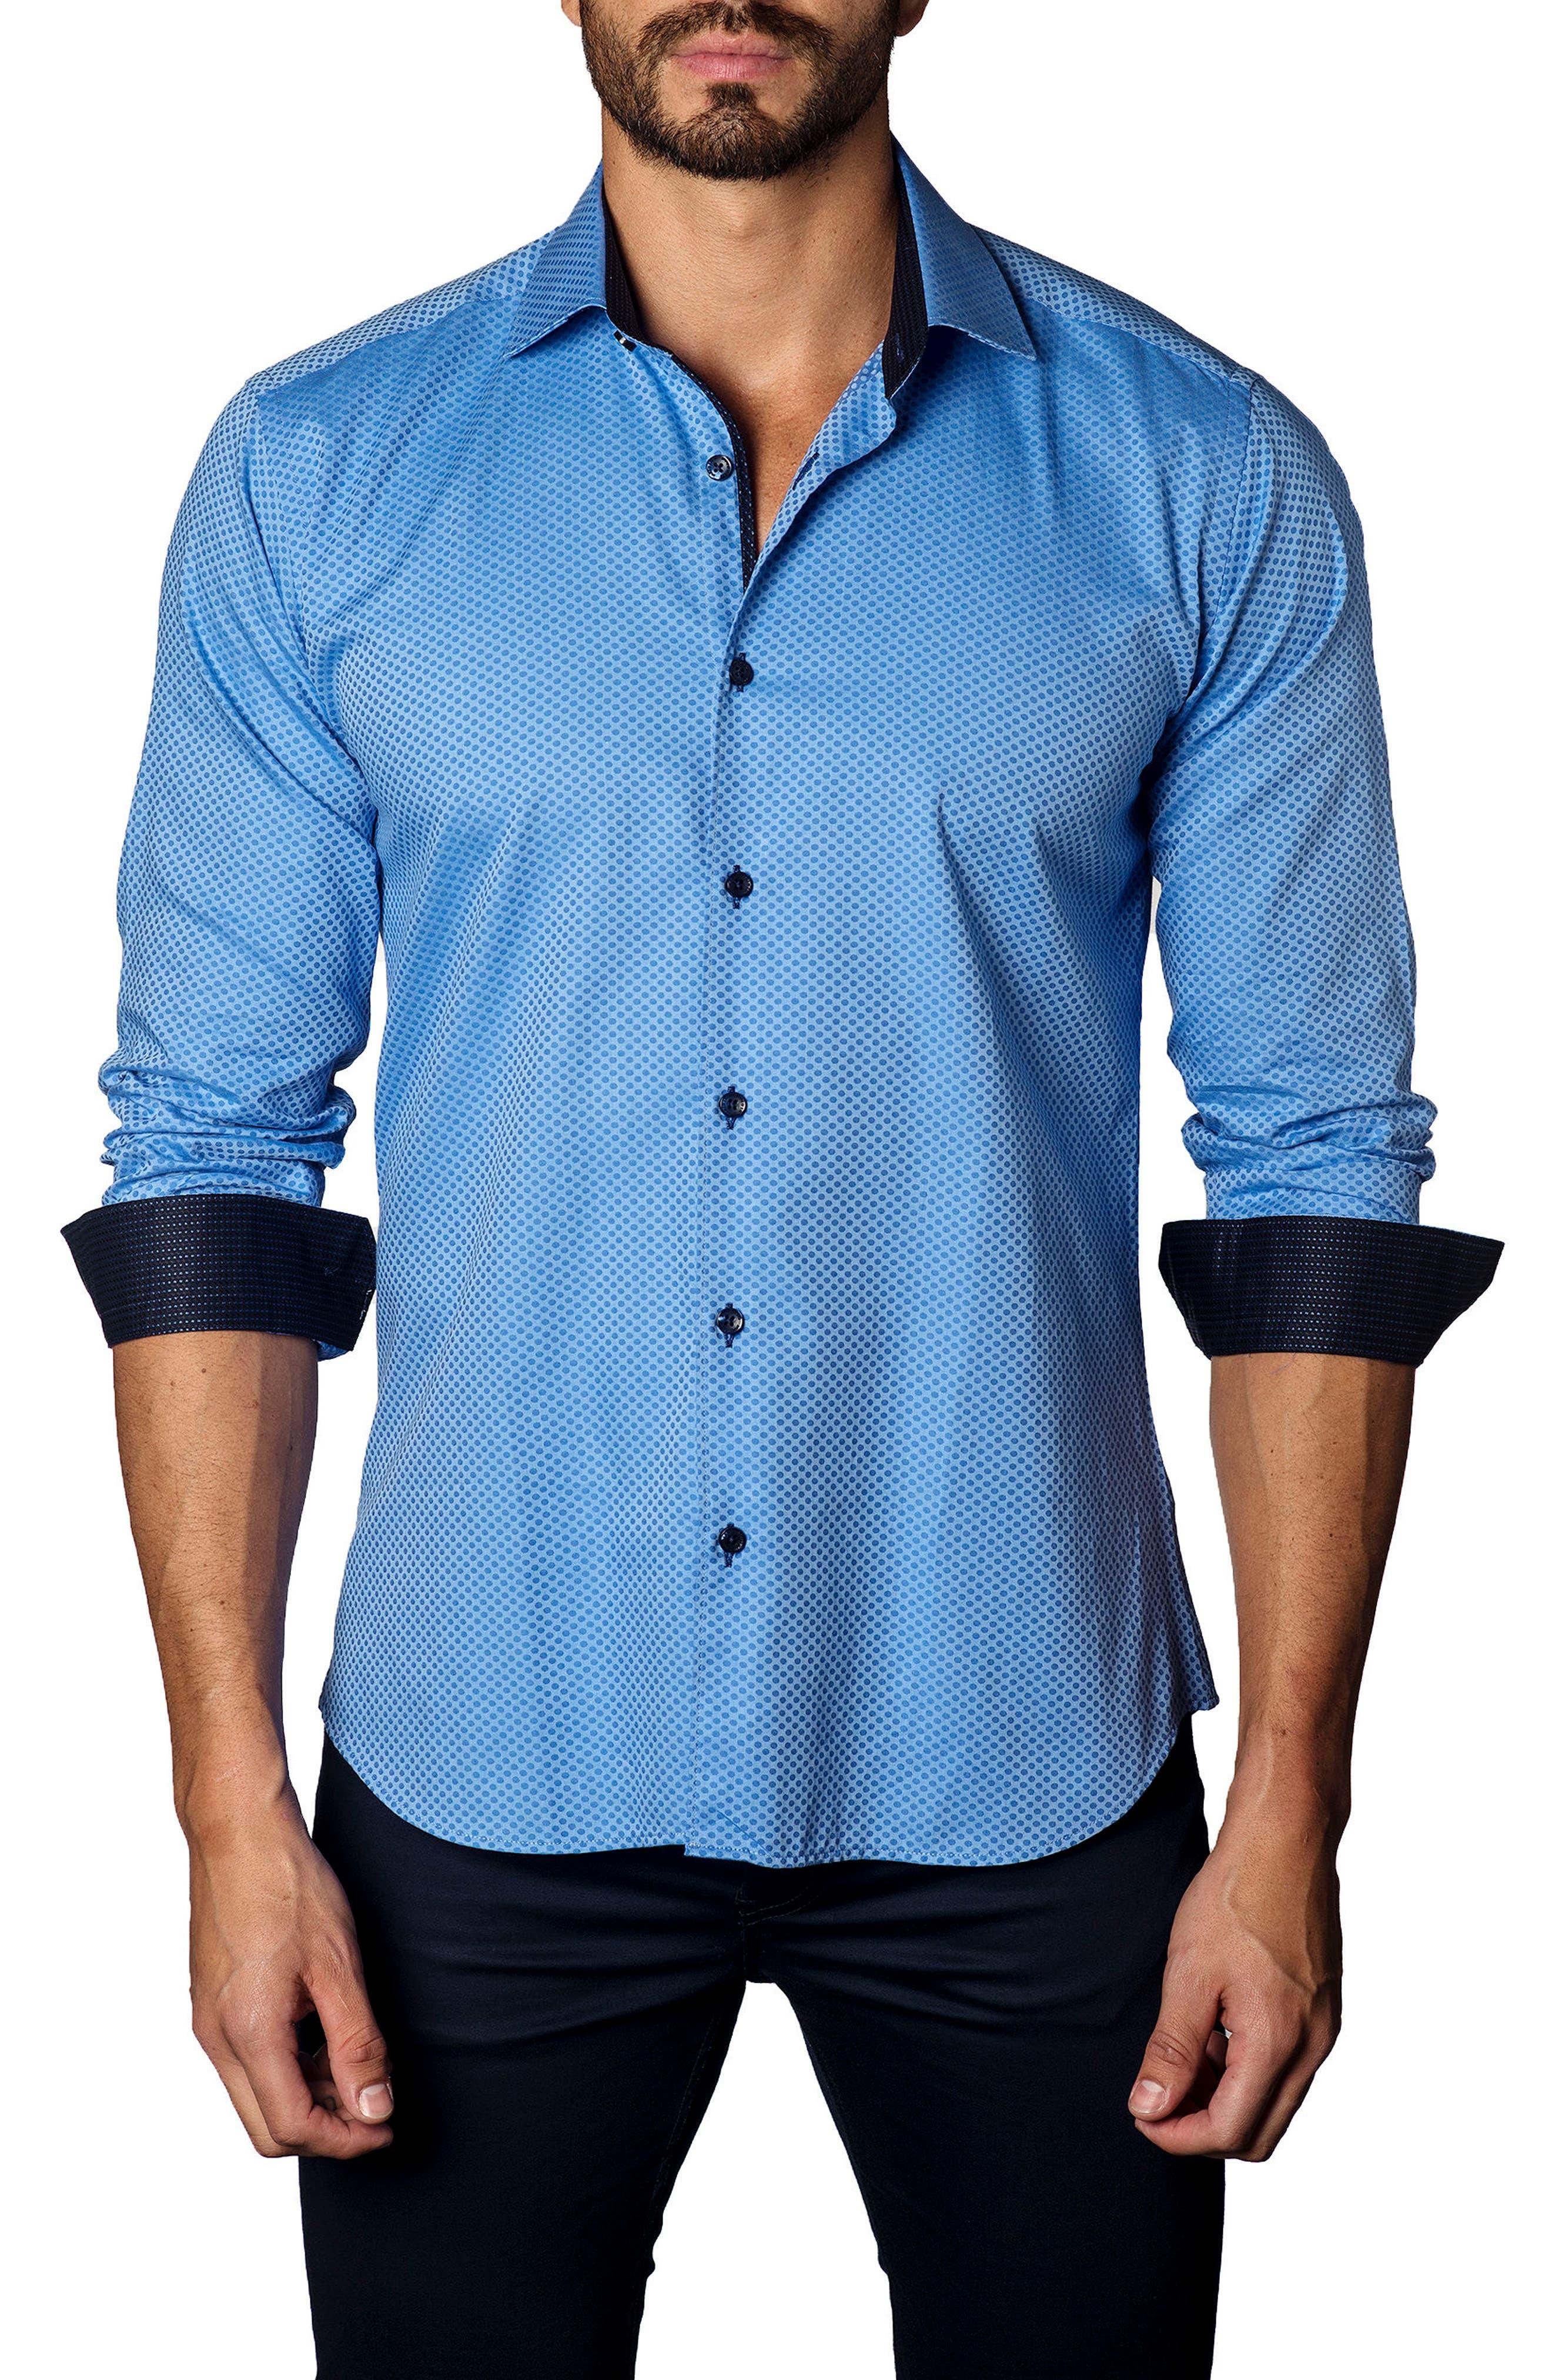 Alternate Image 1 Selected - Jared Lang Trim Fit Dot Jacquard Sport Shirt